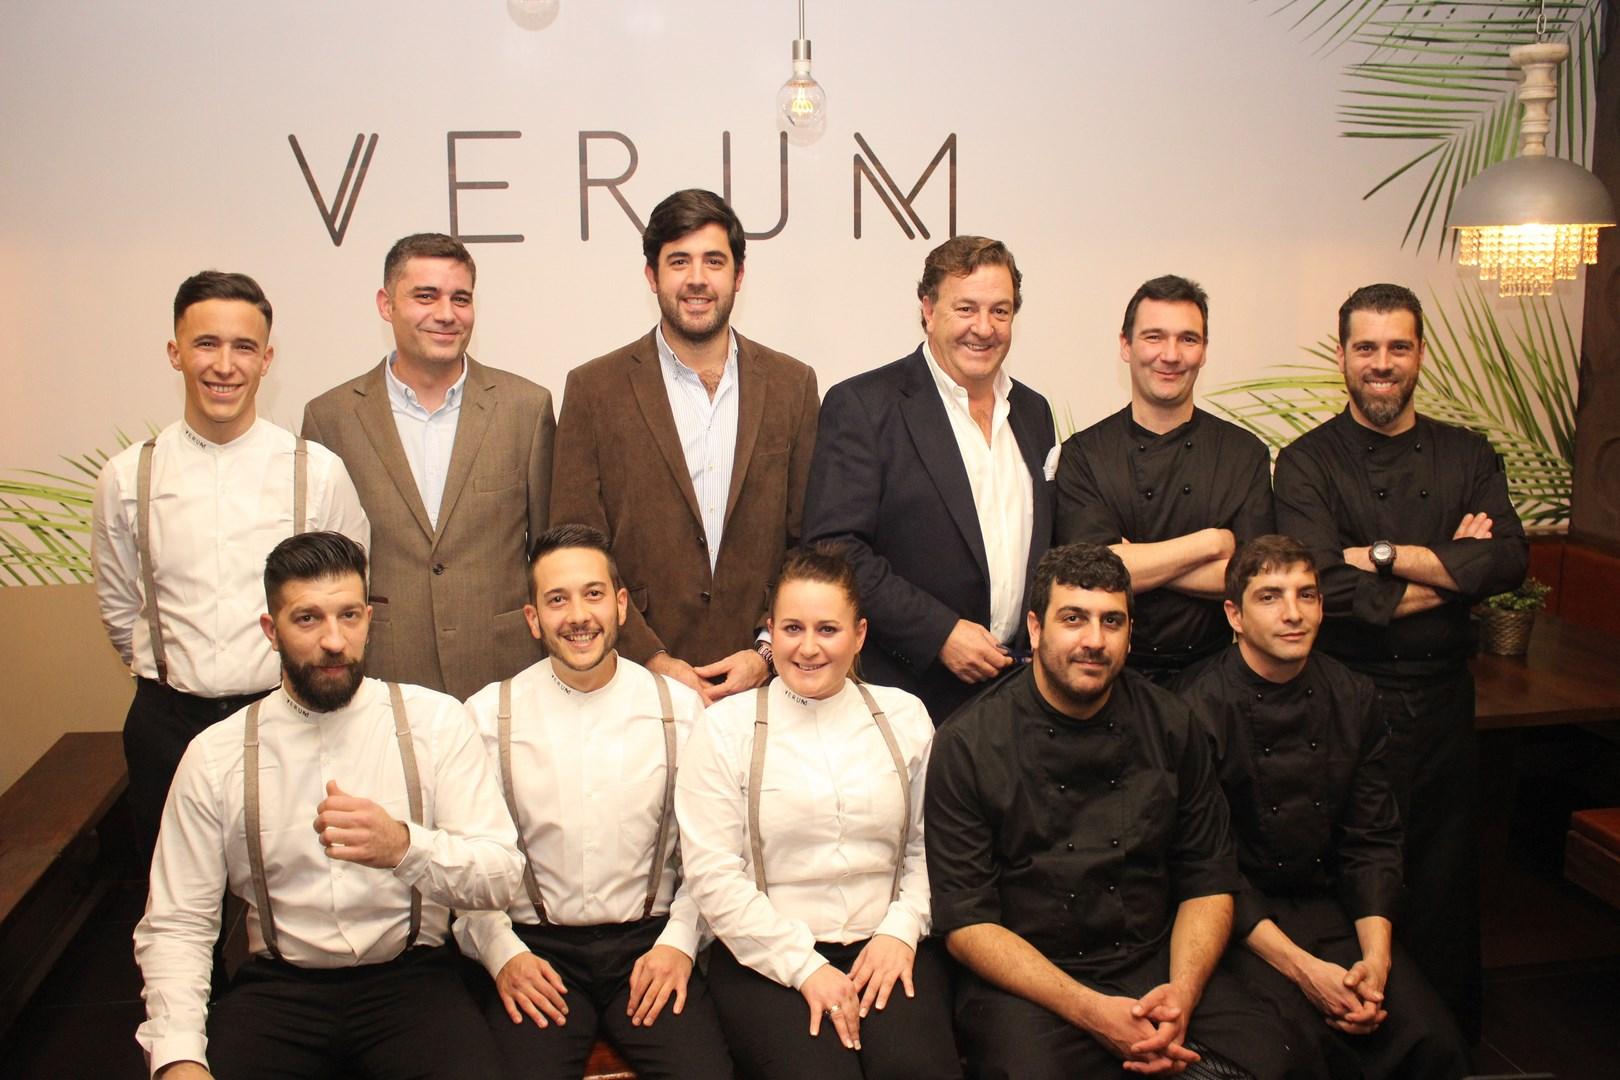 2 Equipo de Restaurante Verum